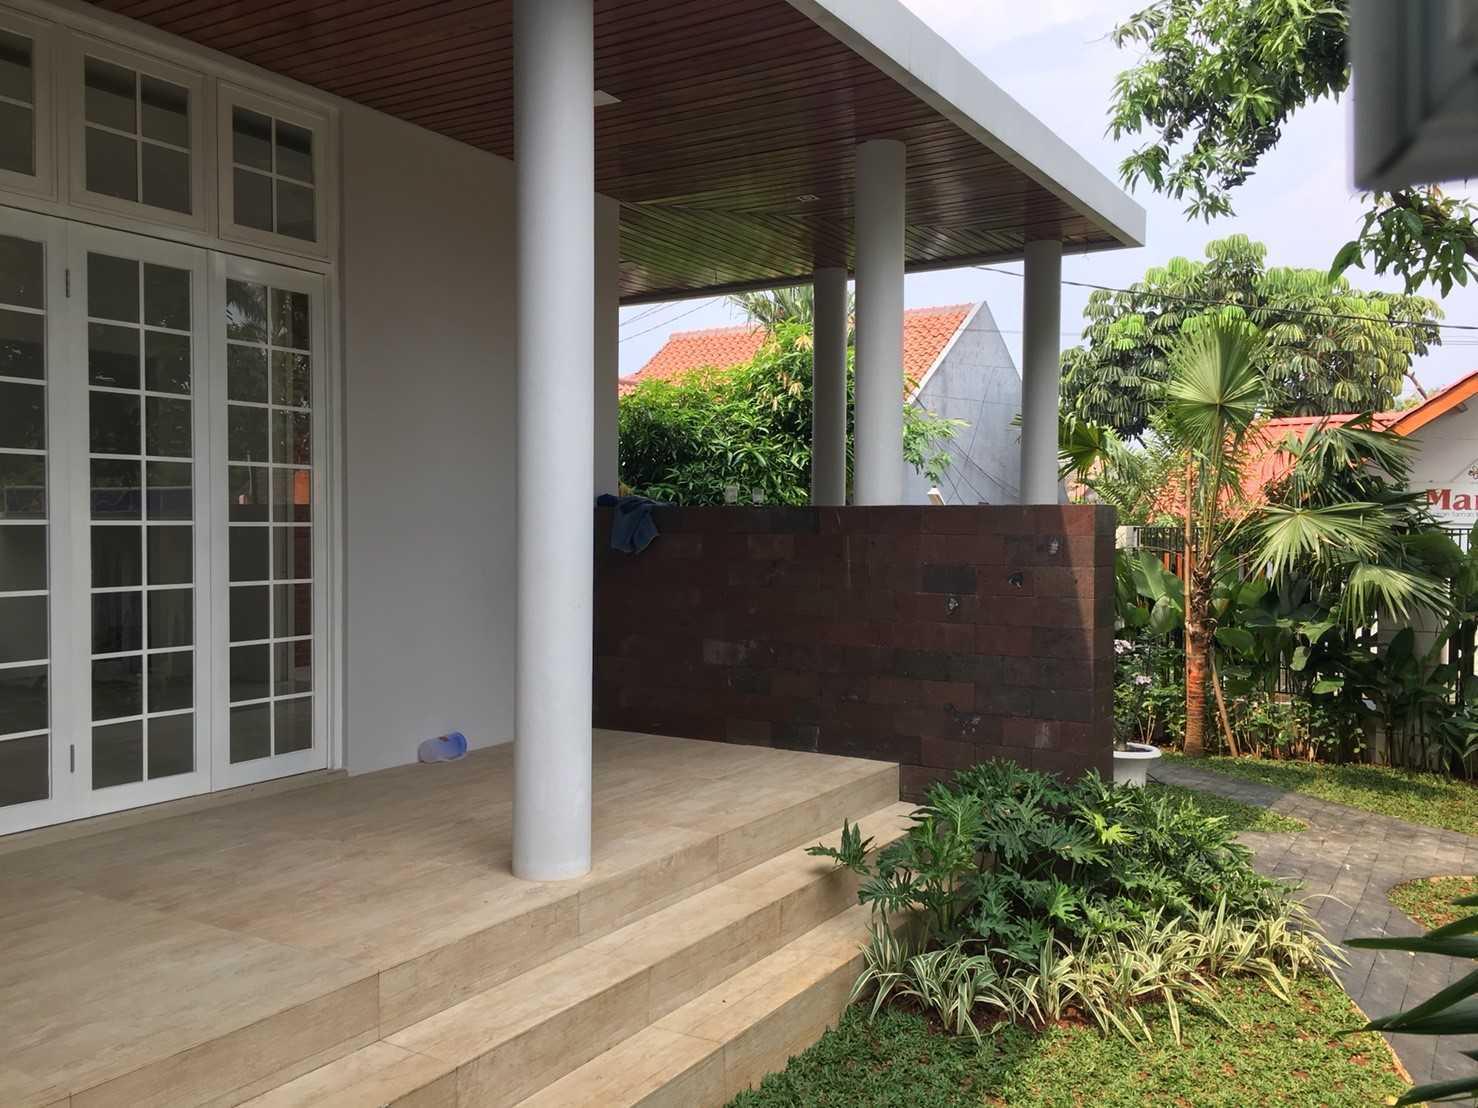 Ho.la Studio Arsitektur K House Bekasi Bar., Kota Bks, Jawa Barat, Indonesia Bekasi Bar., Kota Bks, Jawa Barat, Indonesia Hola-Studio-Arsitektur-K-House   68925